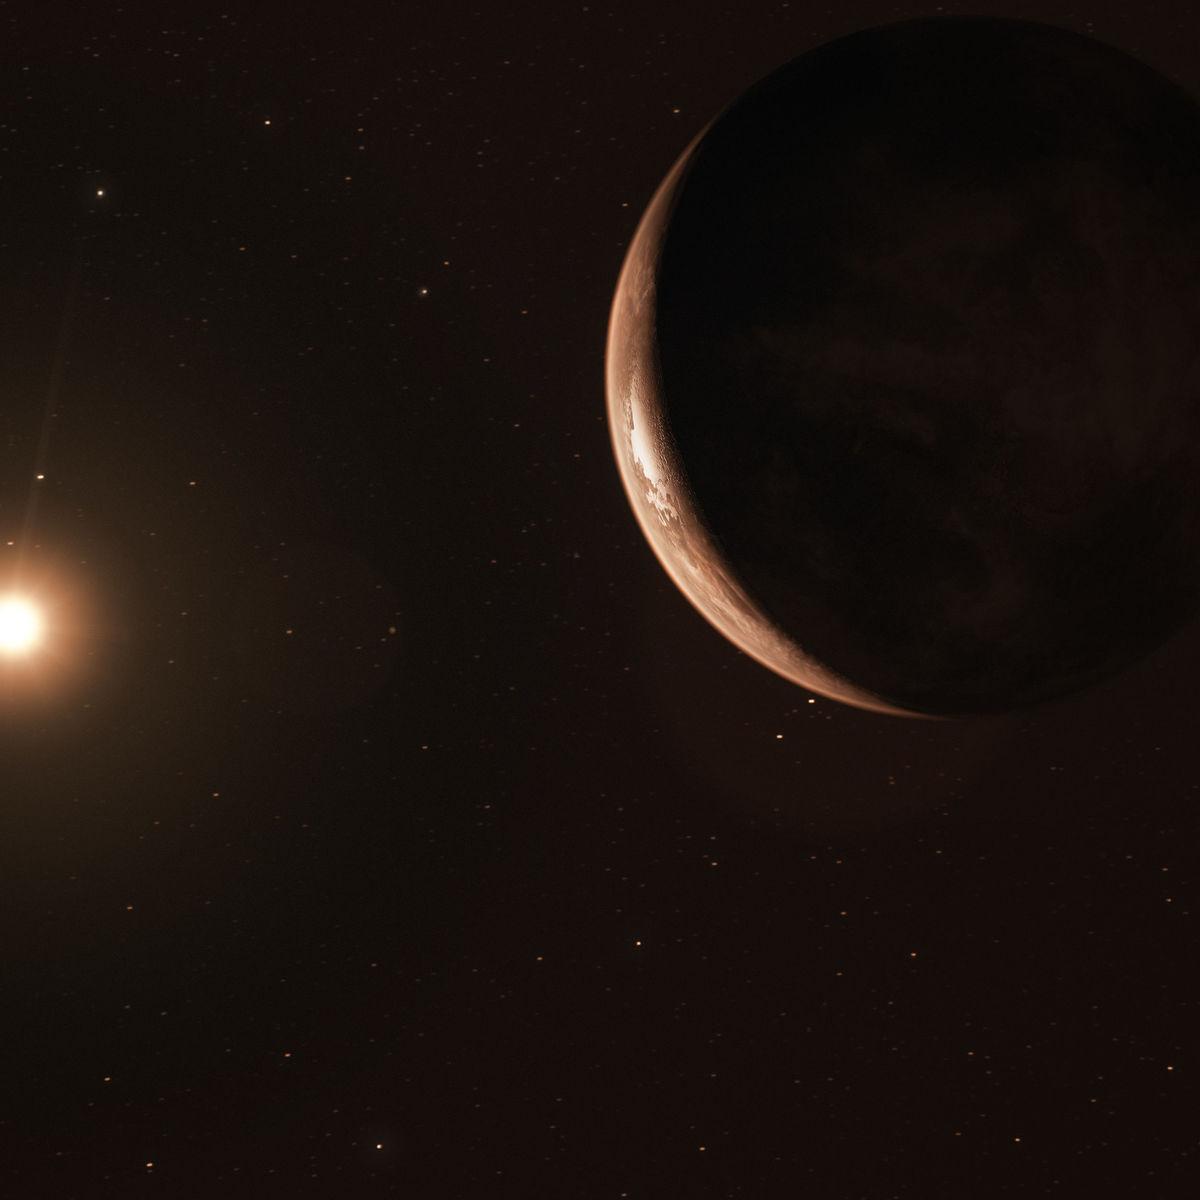 Artwork of a super-Earth, Barnard's Star b, orbiting its red dwarf host star. Credit: ESO/M. Kornmesser